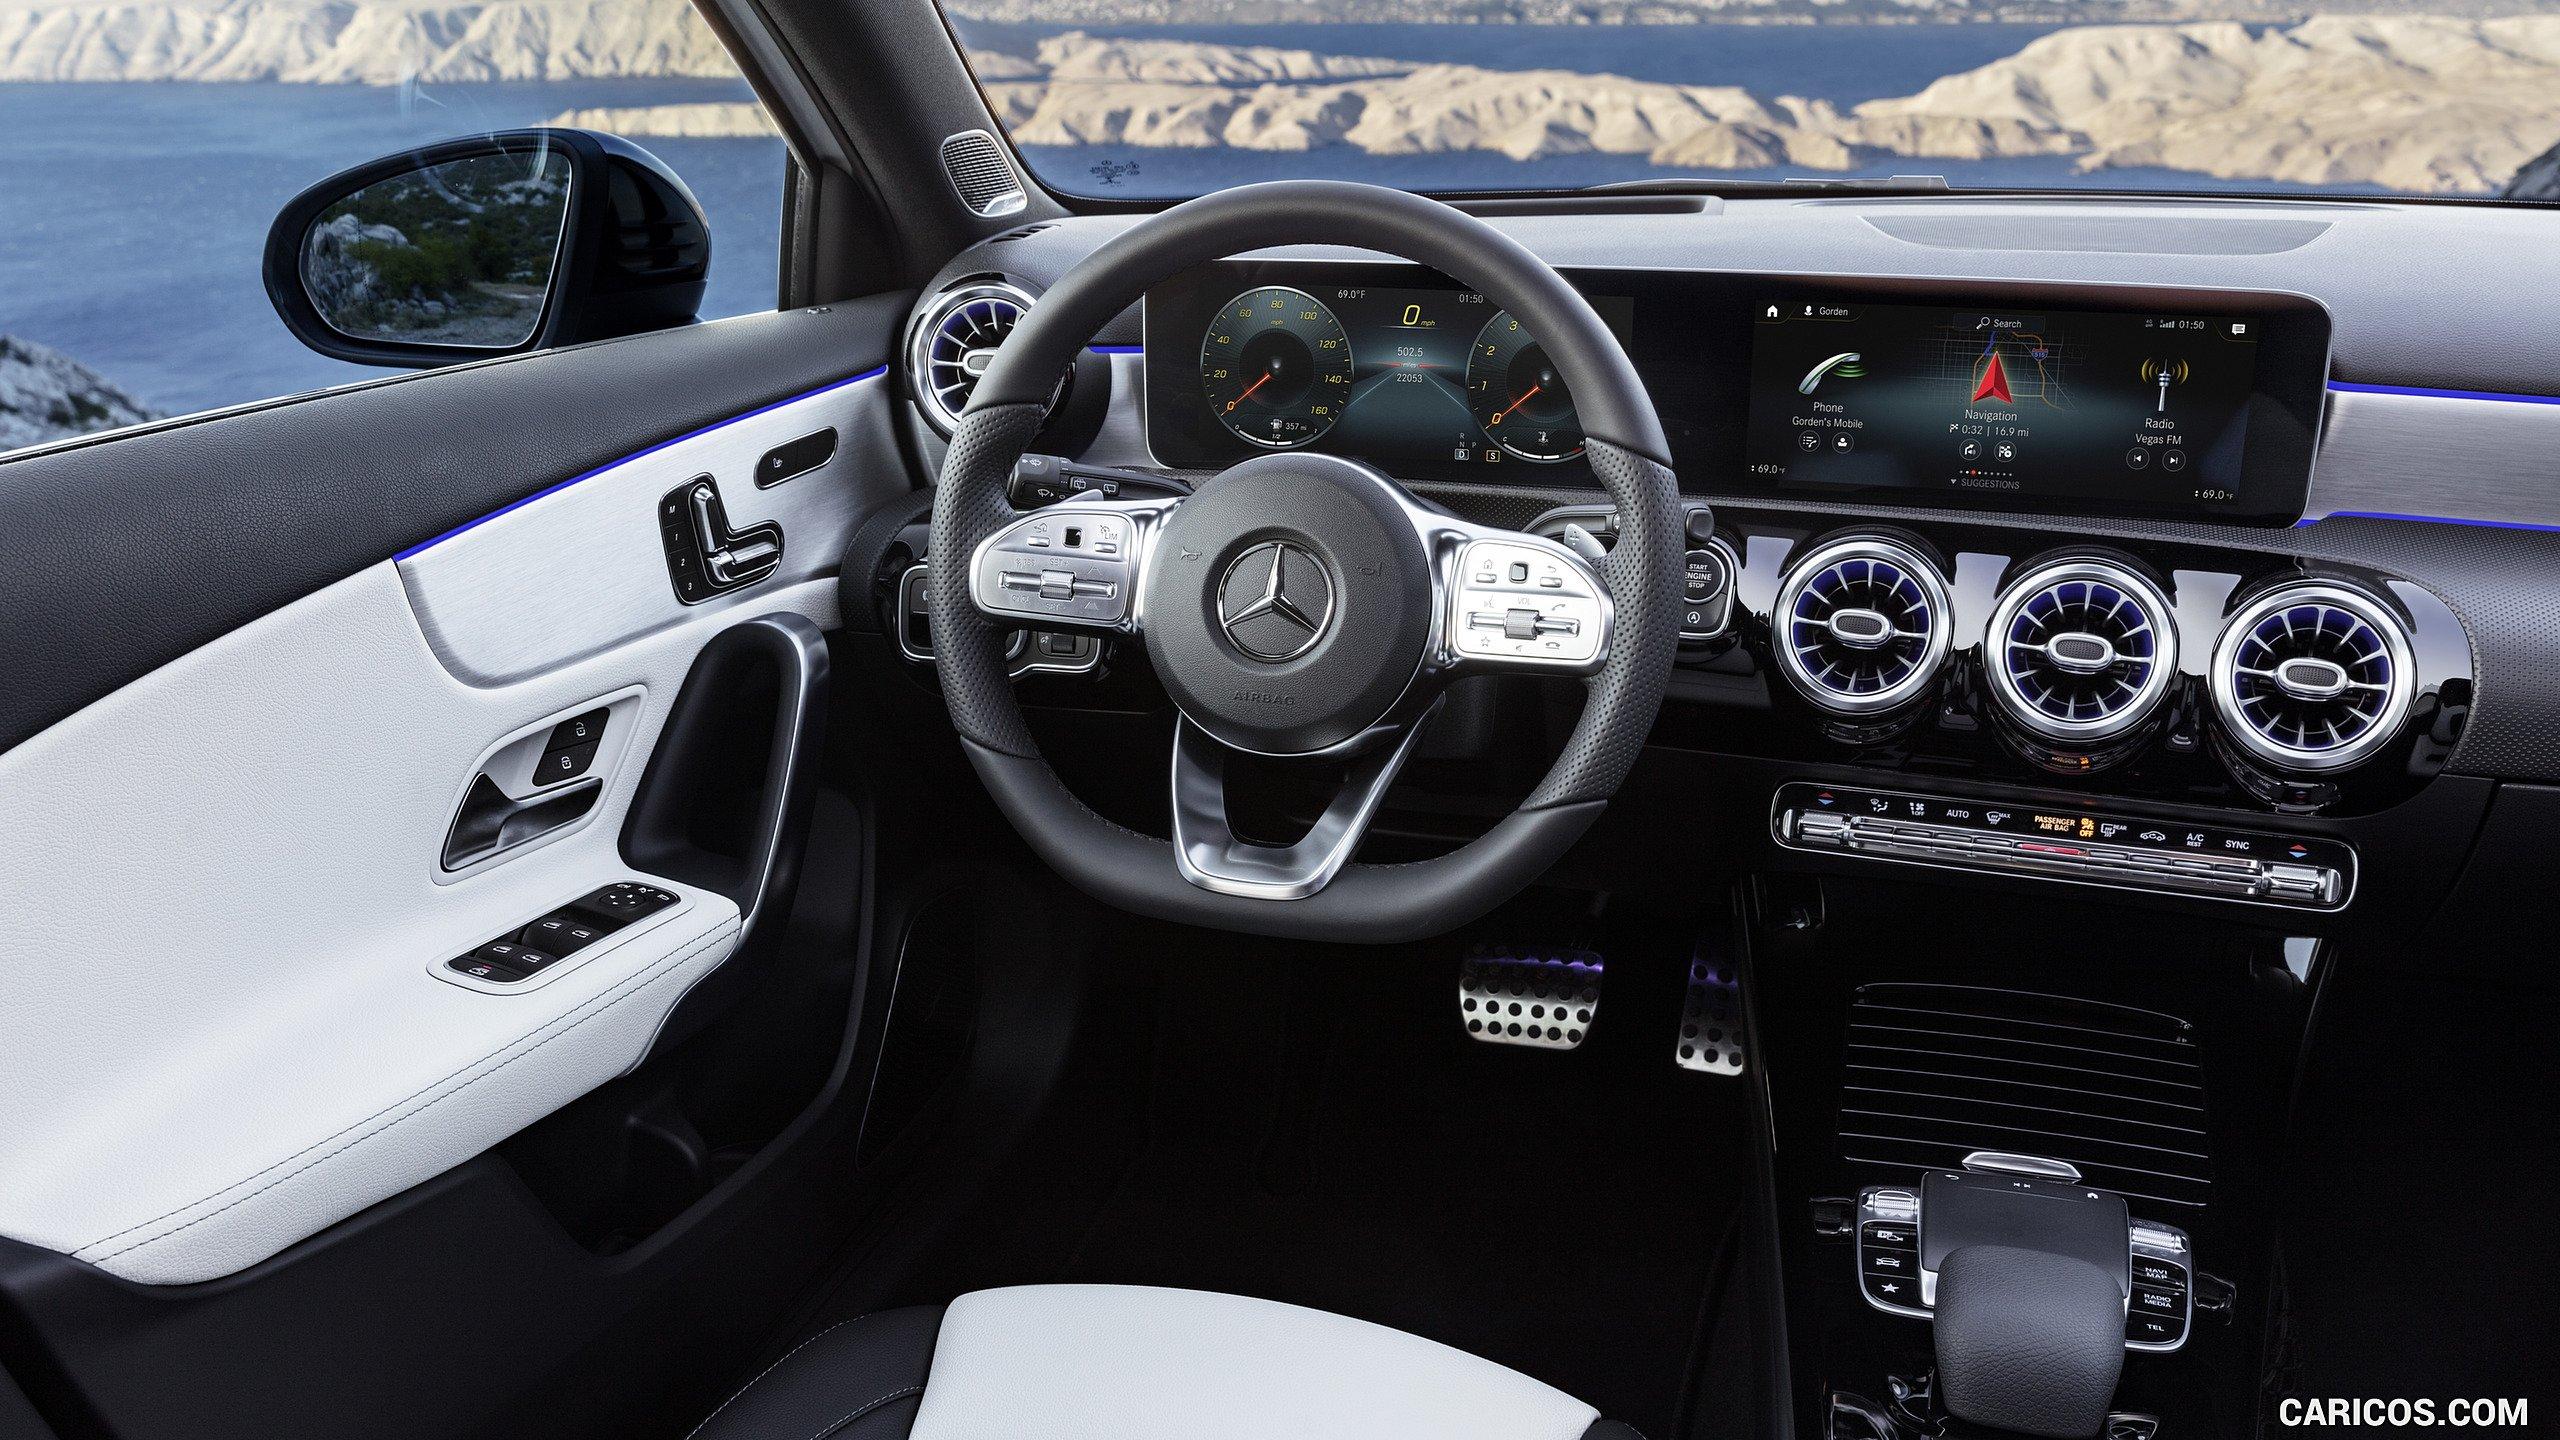 2019 Mercedes Benz A Class   AMG Line nevagreyblack Interior HD 2560x1440